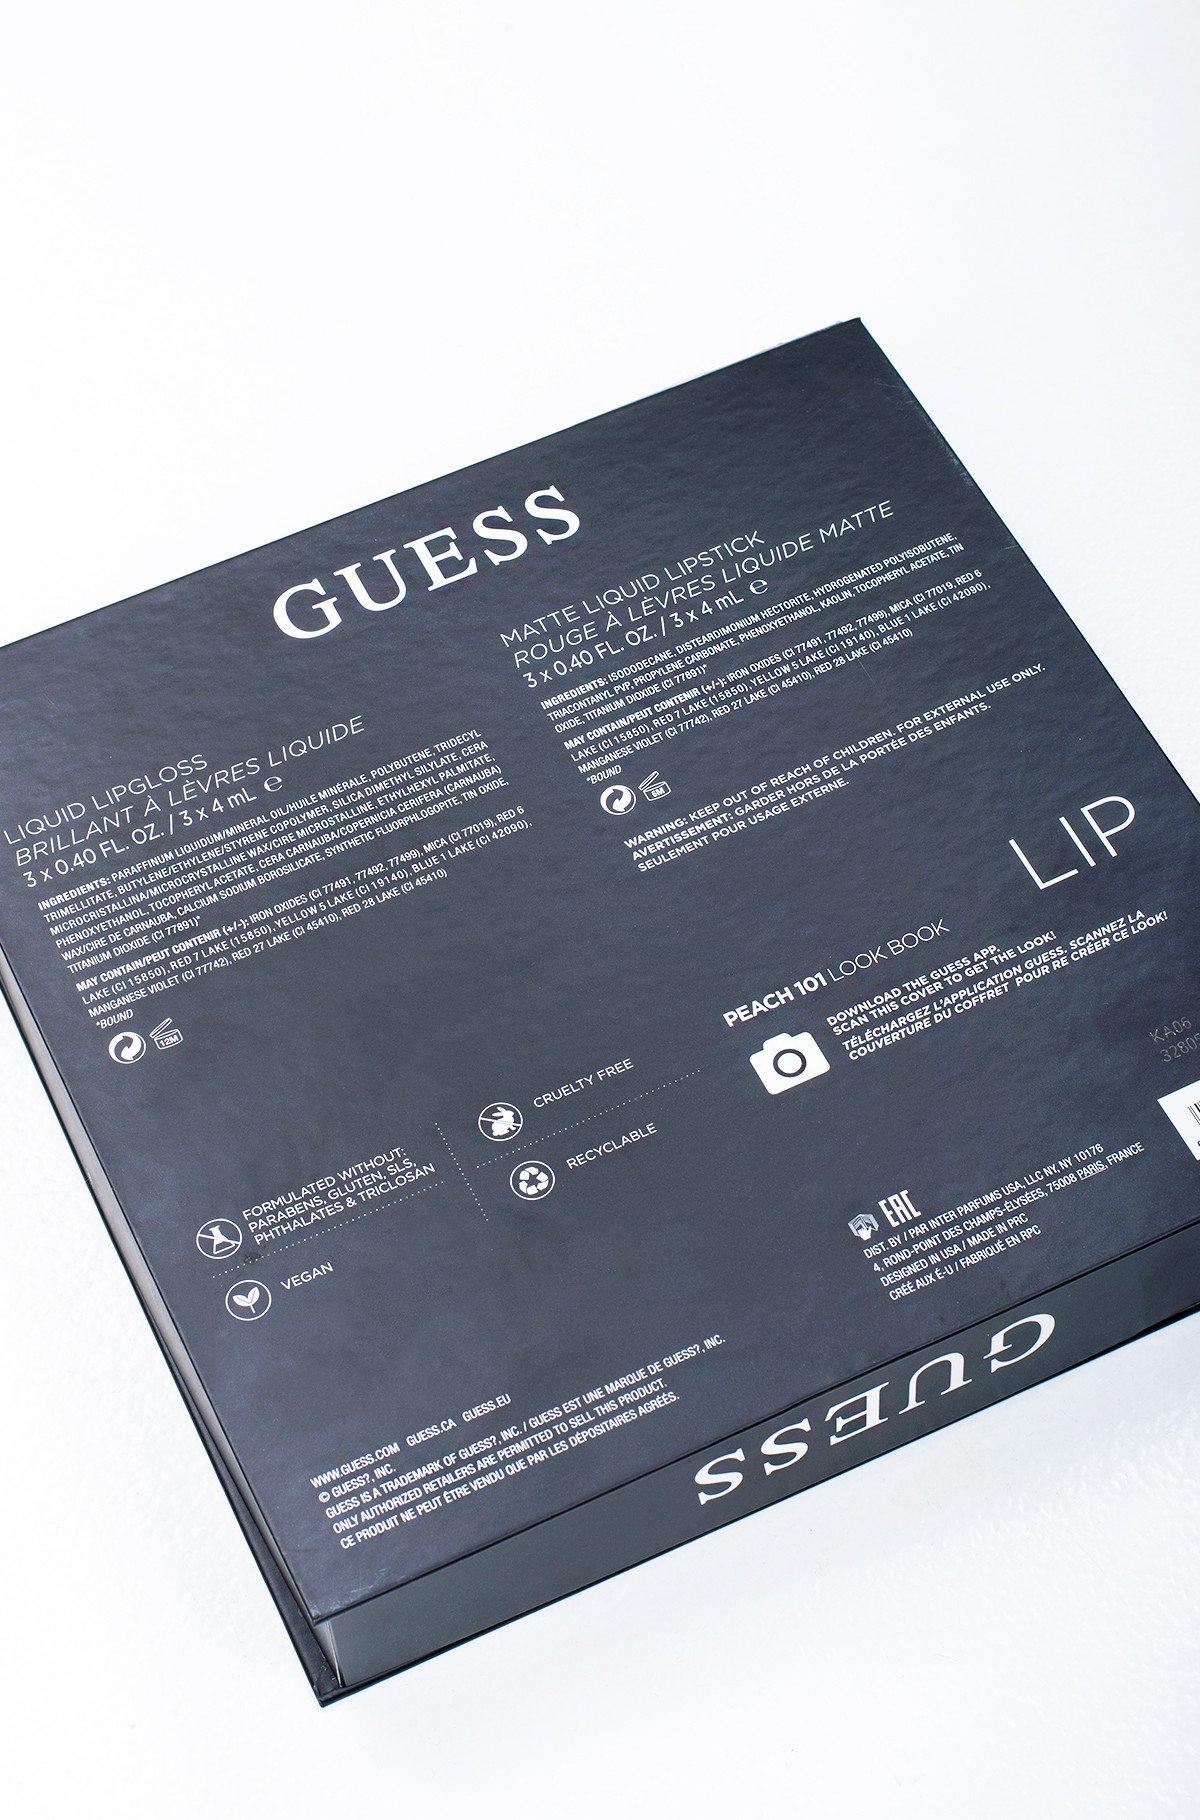 Dekoratīvās kosmētikas komplekts Guess Season 1 Nude 101 LIP KIT-full-4